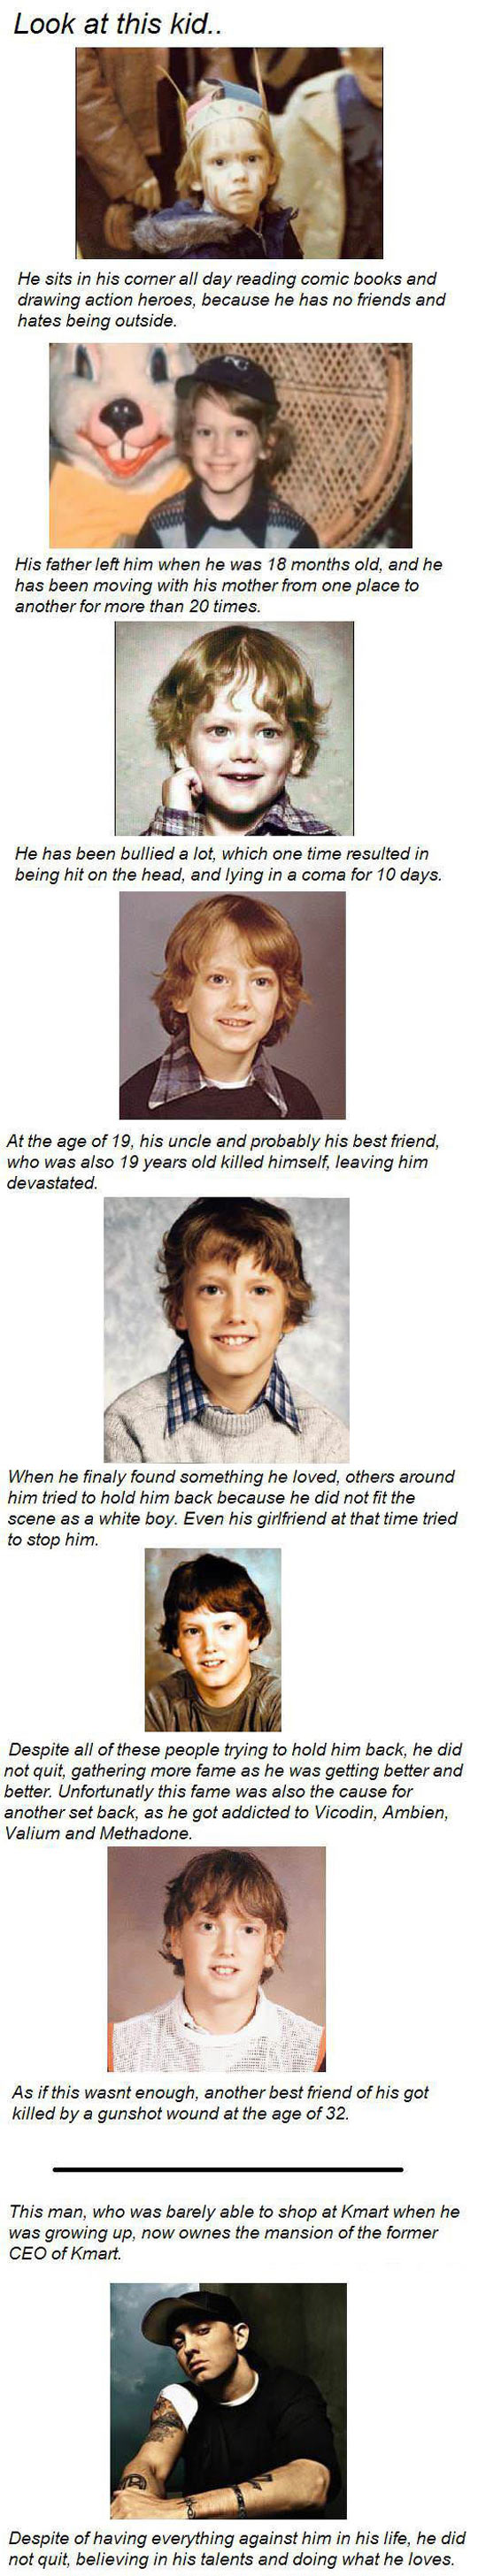 funny-Eminem-story-kid-bullying-friends